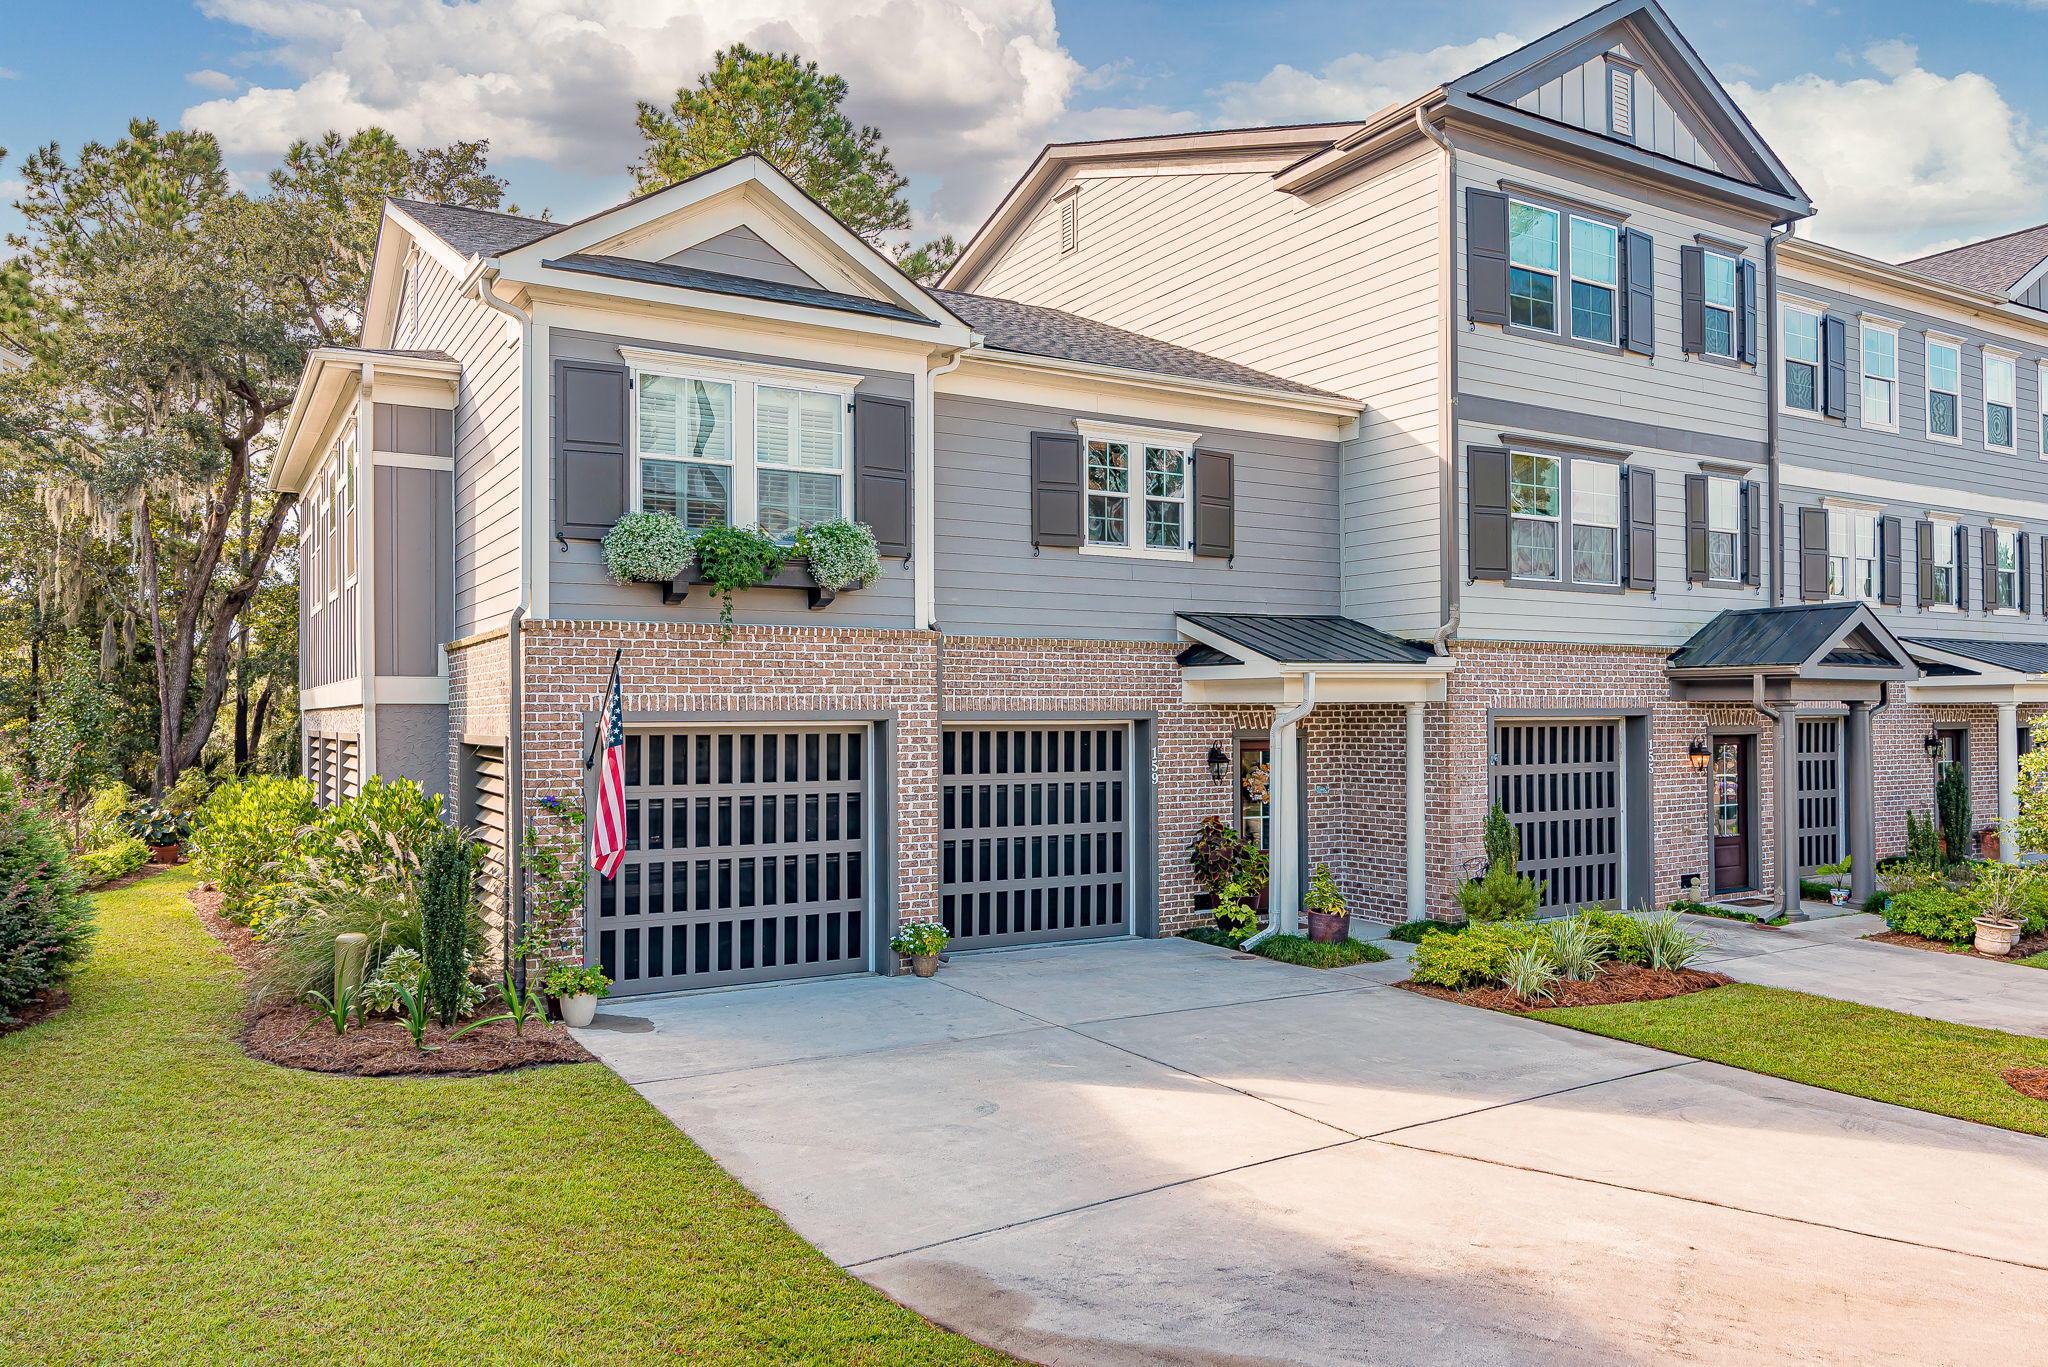 Etiwan Pointe Homes For Sale - 159 Slipper Shell, Mount Pleasant, SC - 36